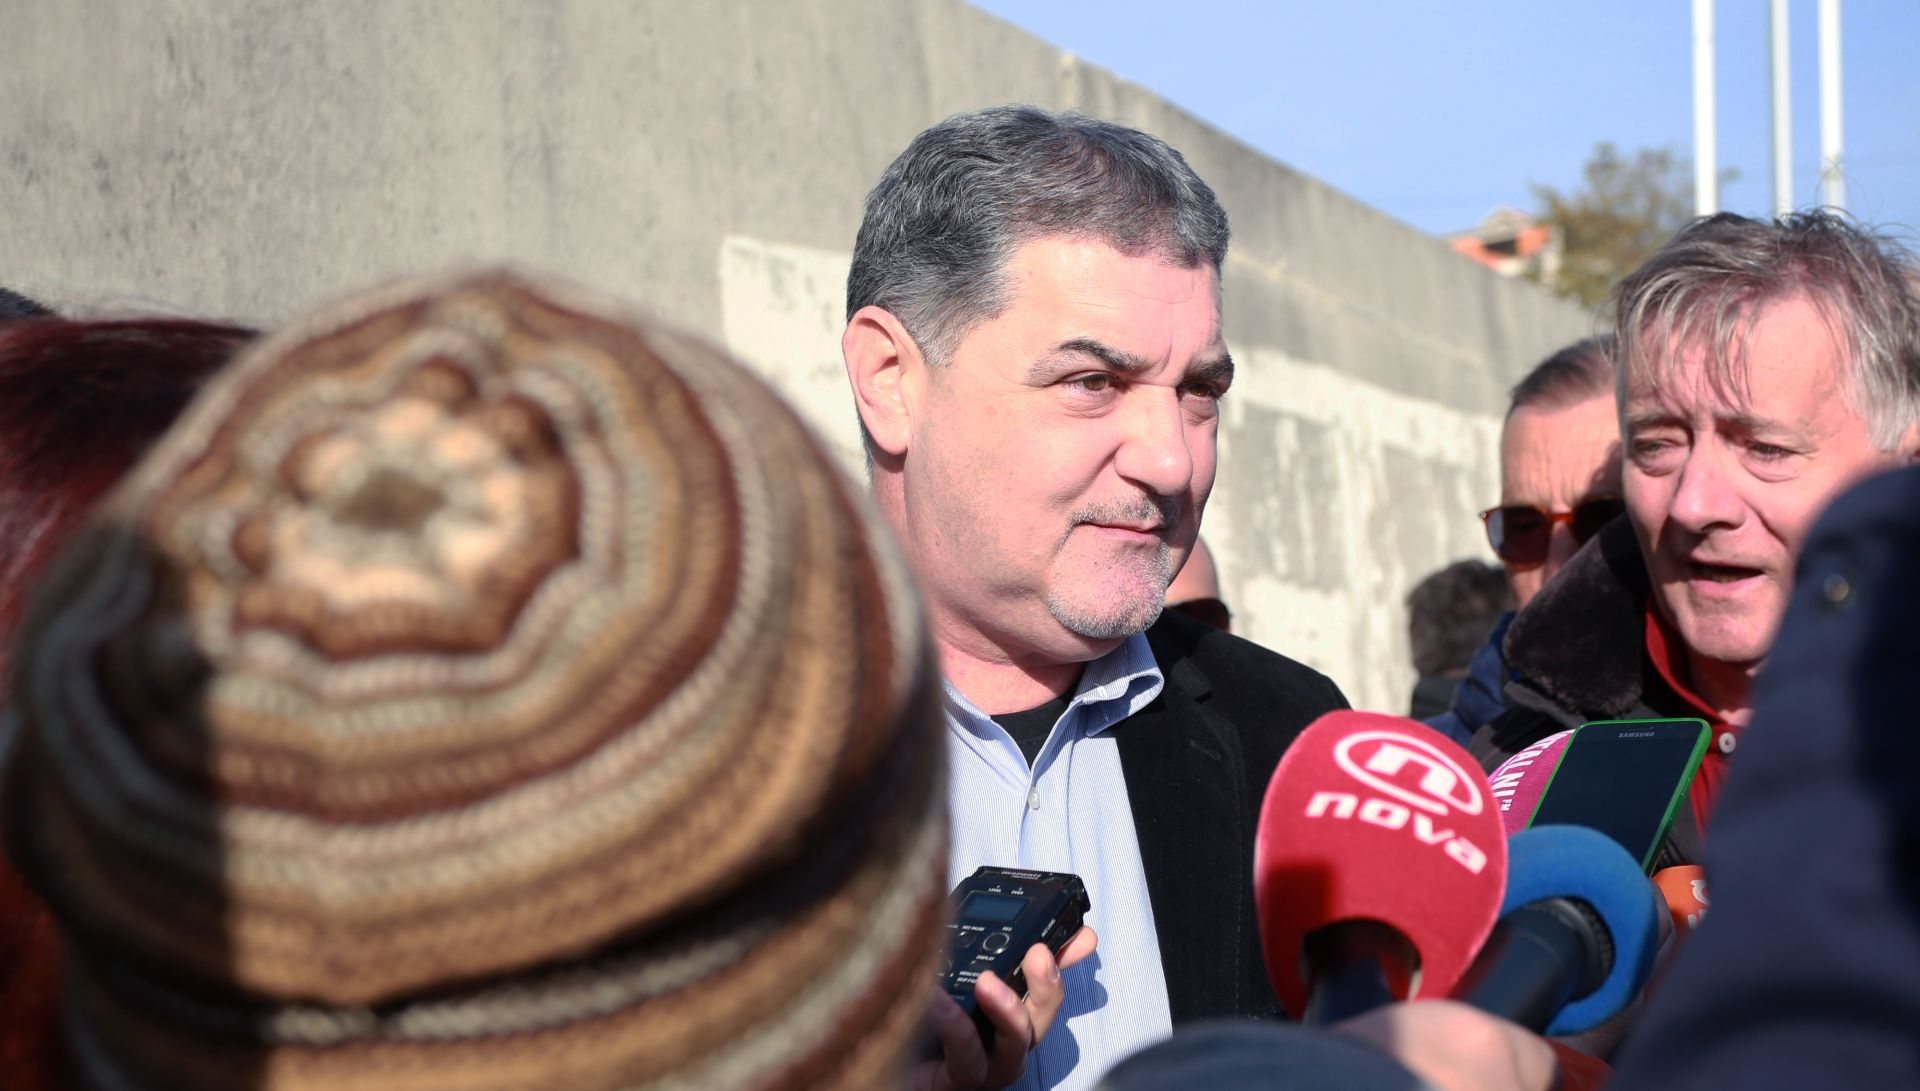 BALDASAR 'Ponovno ću se kandidirati za splitskoga gradonačelnika'